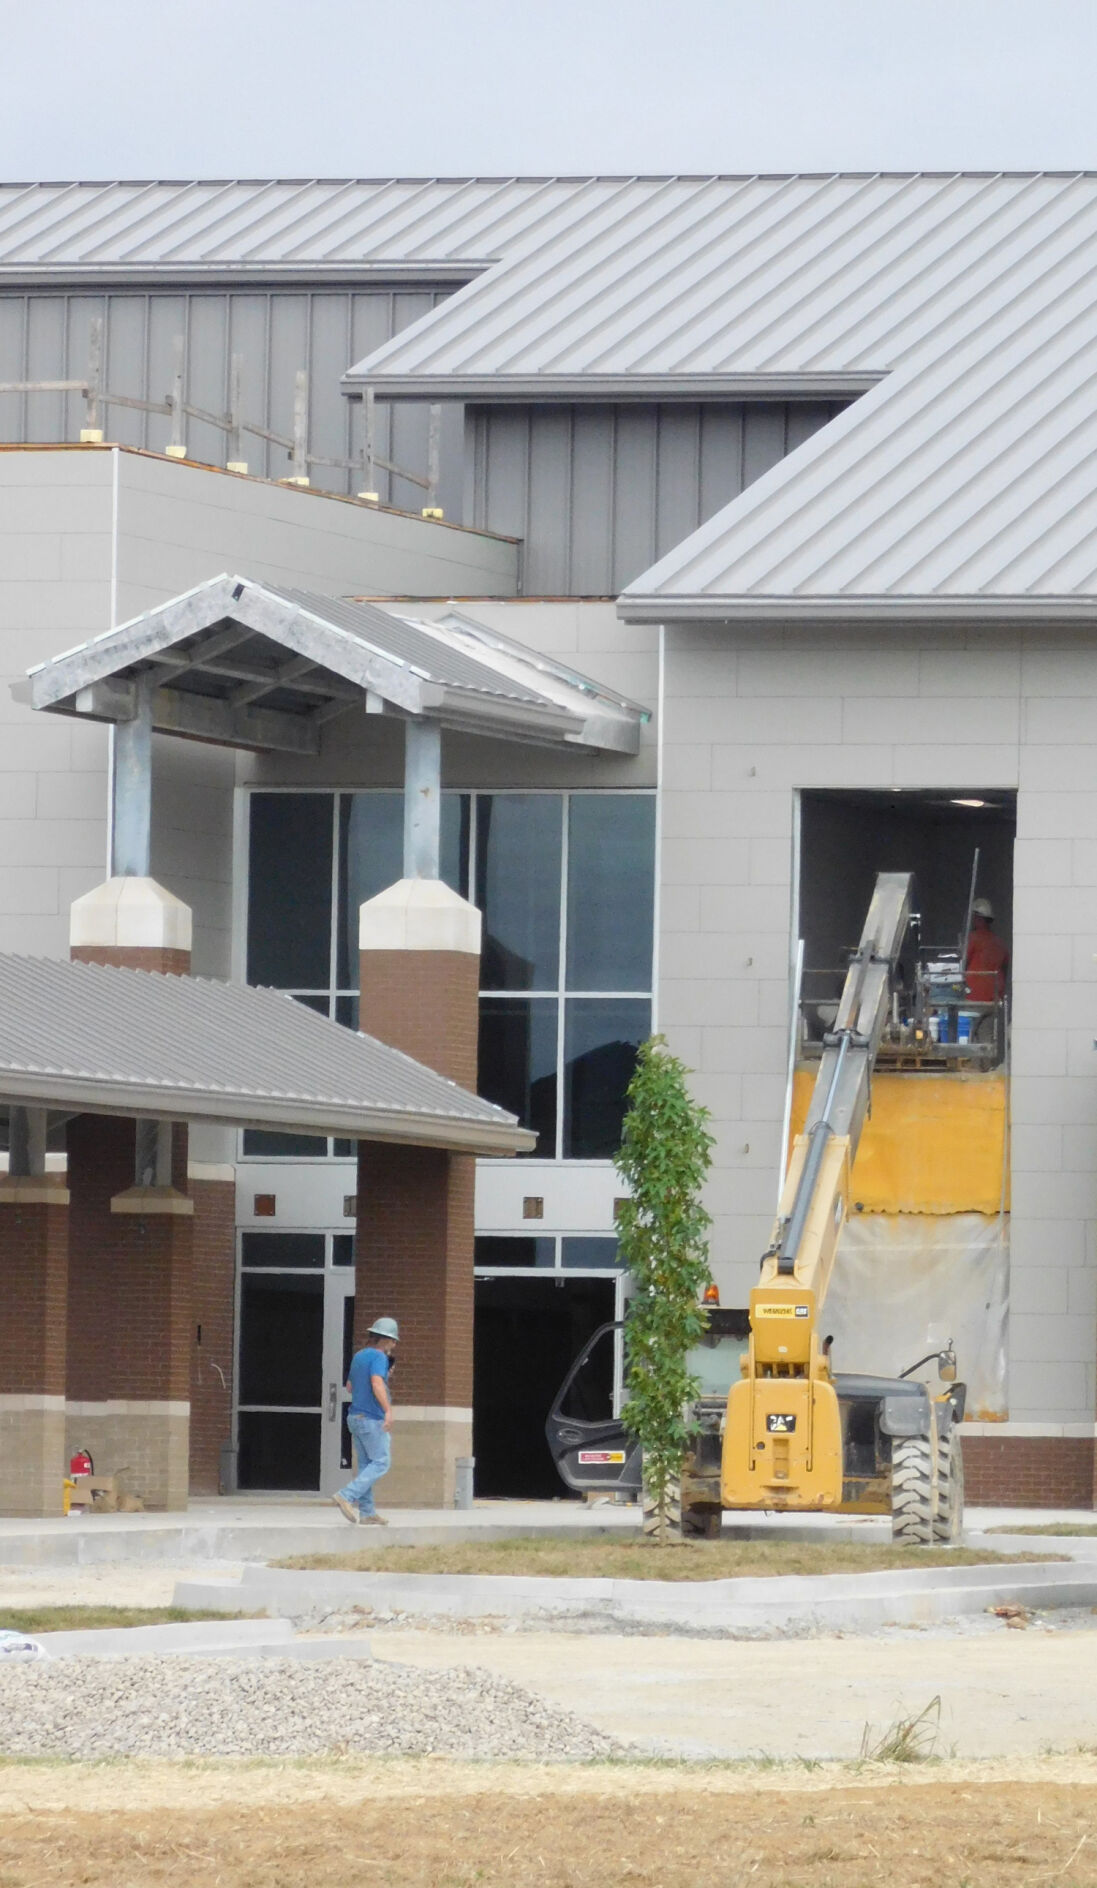 New East Hardin School facing delayed opening